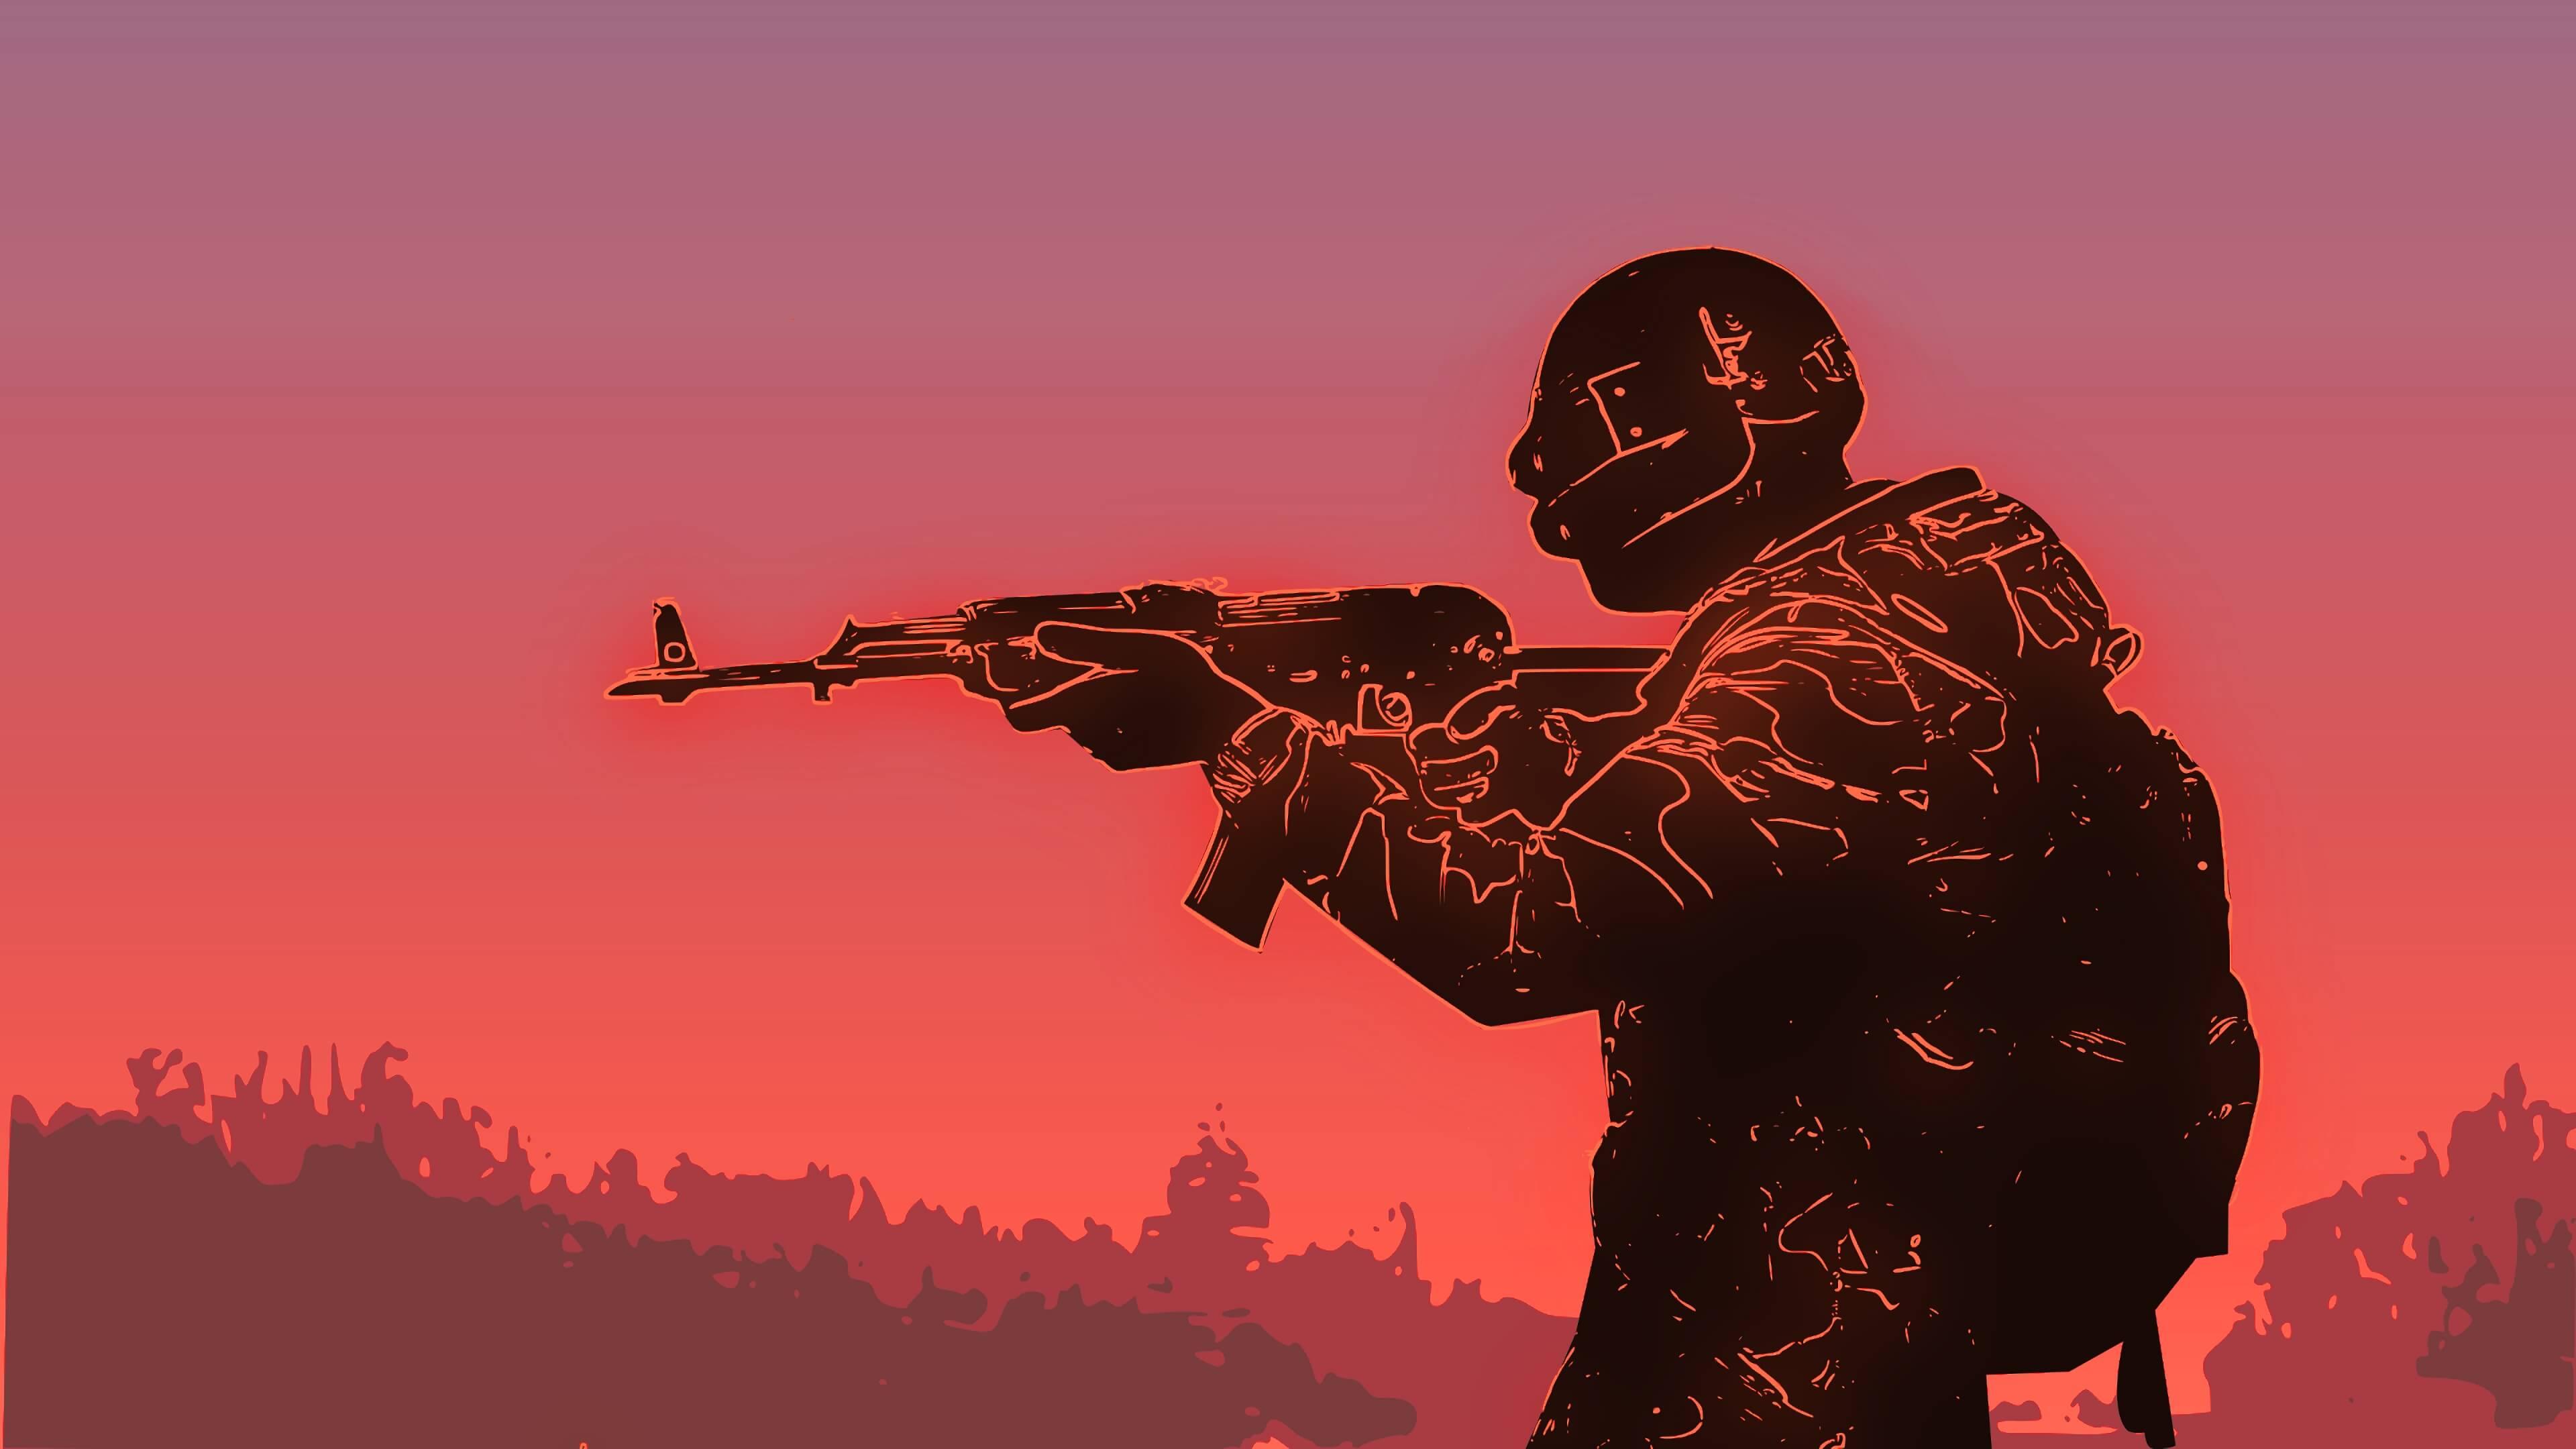 Обои PlayerUnknown's Battlegrounds ак-47